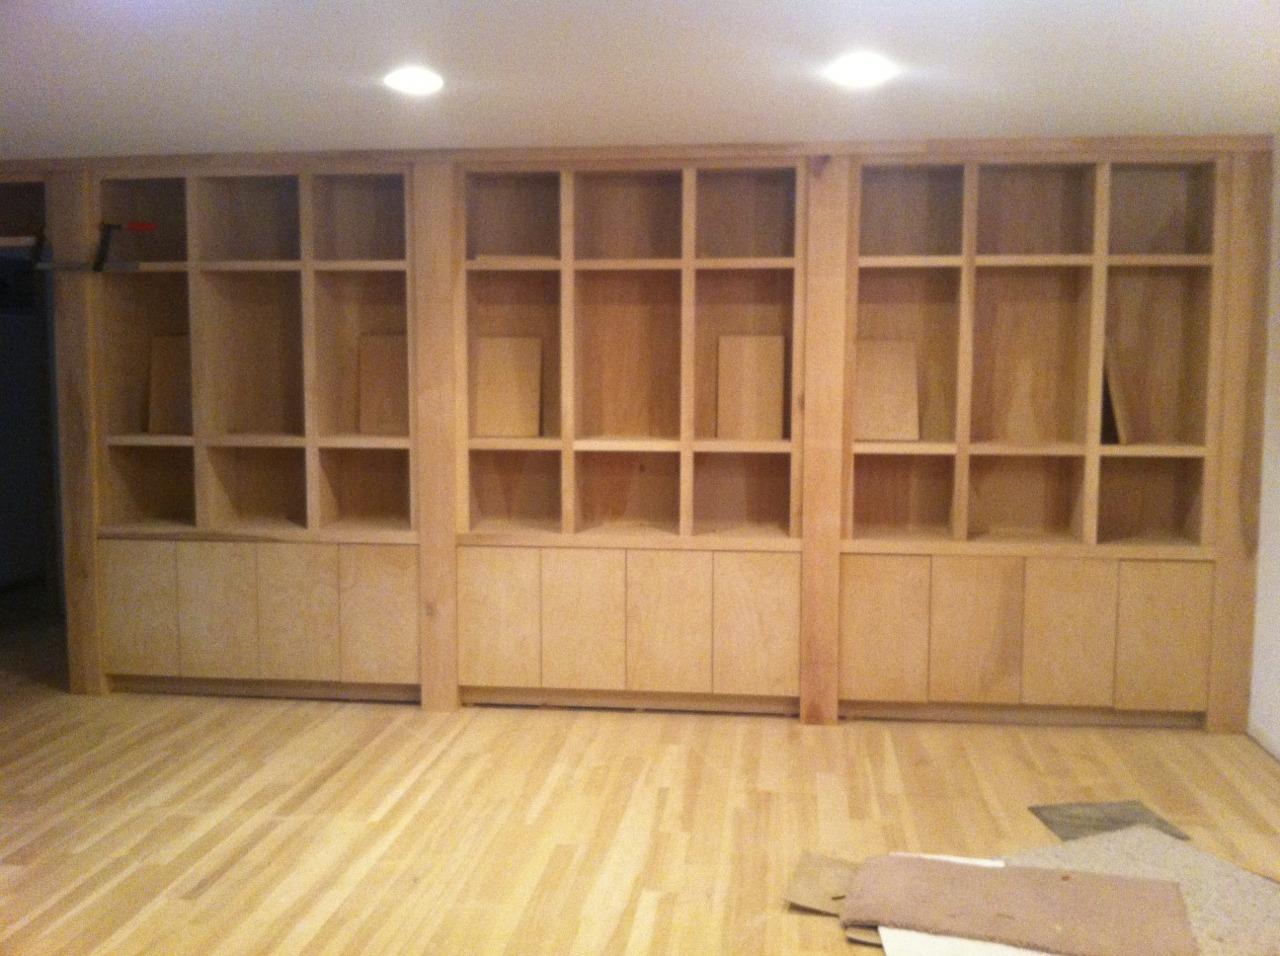 Wallpaper Cabinets Kitchen 1280x956